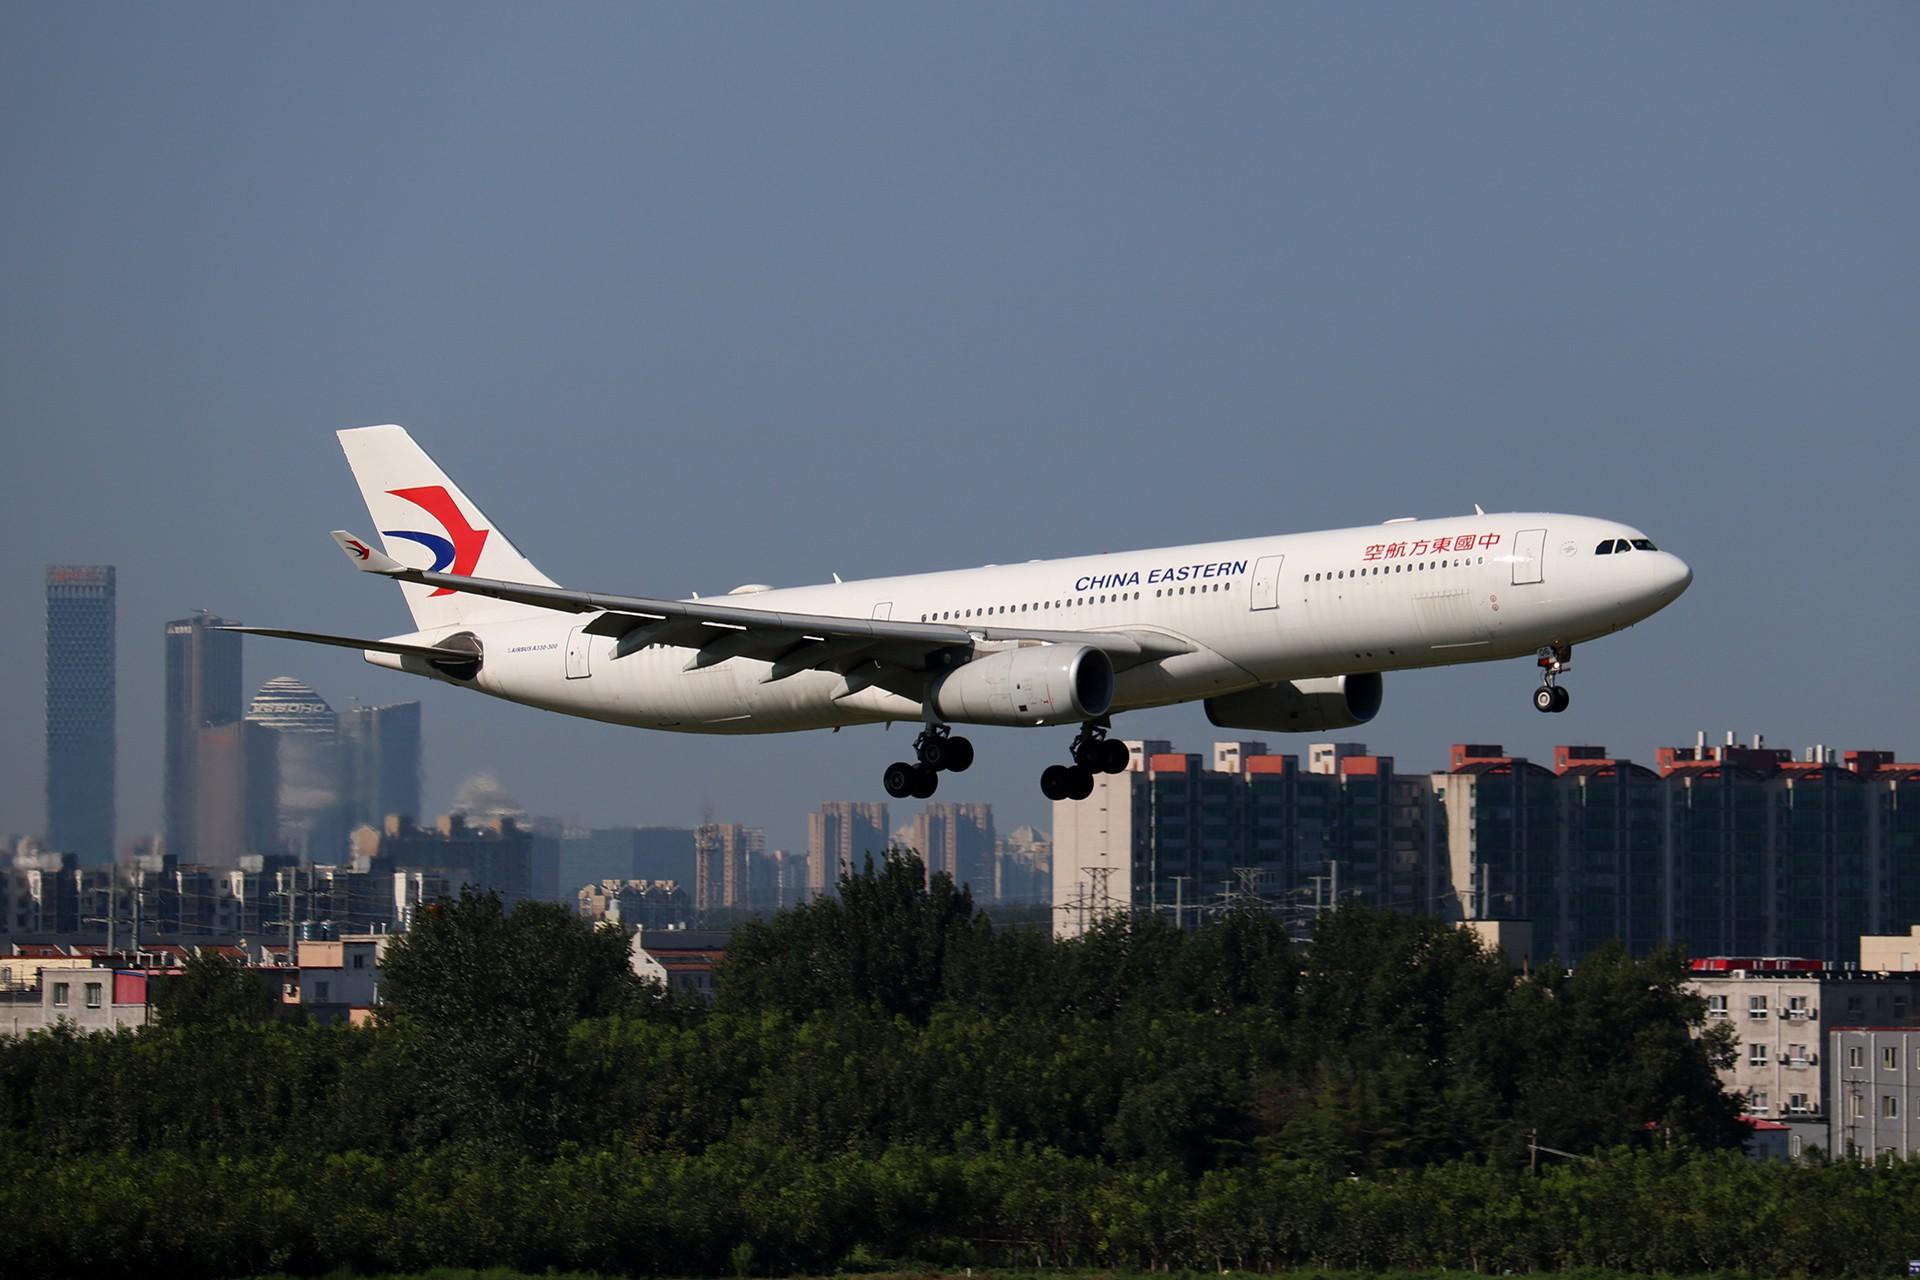 Re:[原创]LIULIU|【PEK】36L降落一组Ⅴ|城市背景下的进近 AIRBUS A330-300 B-6506 中国北京首都国际机场